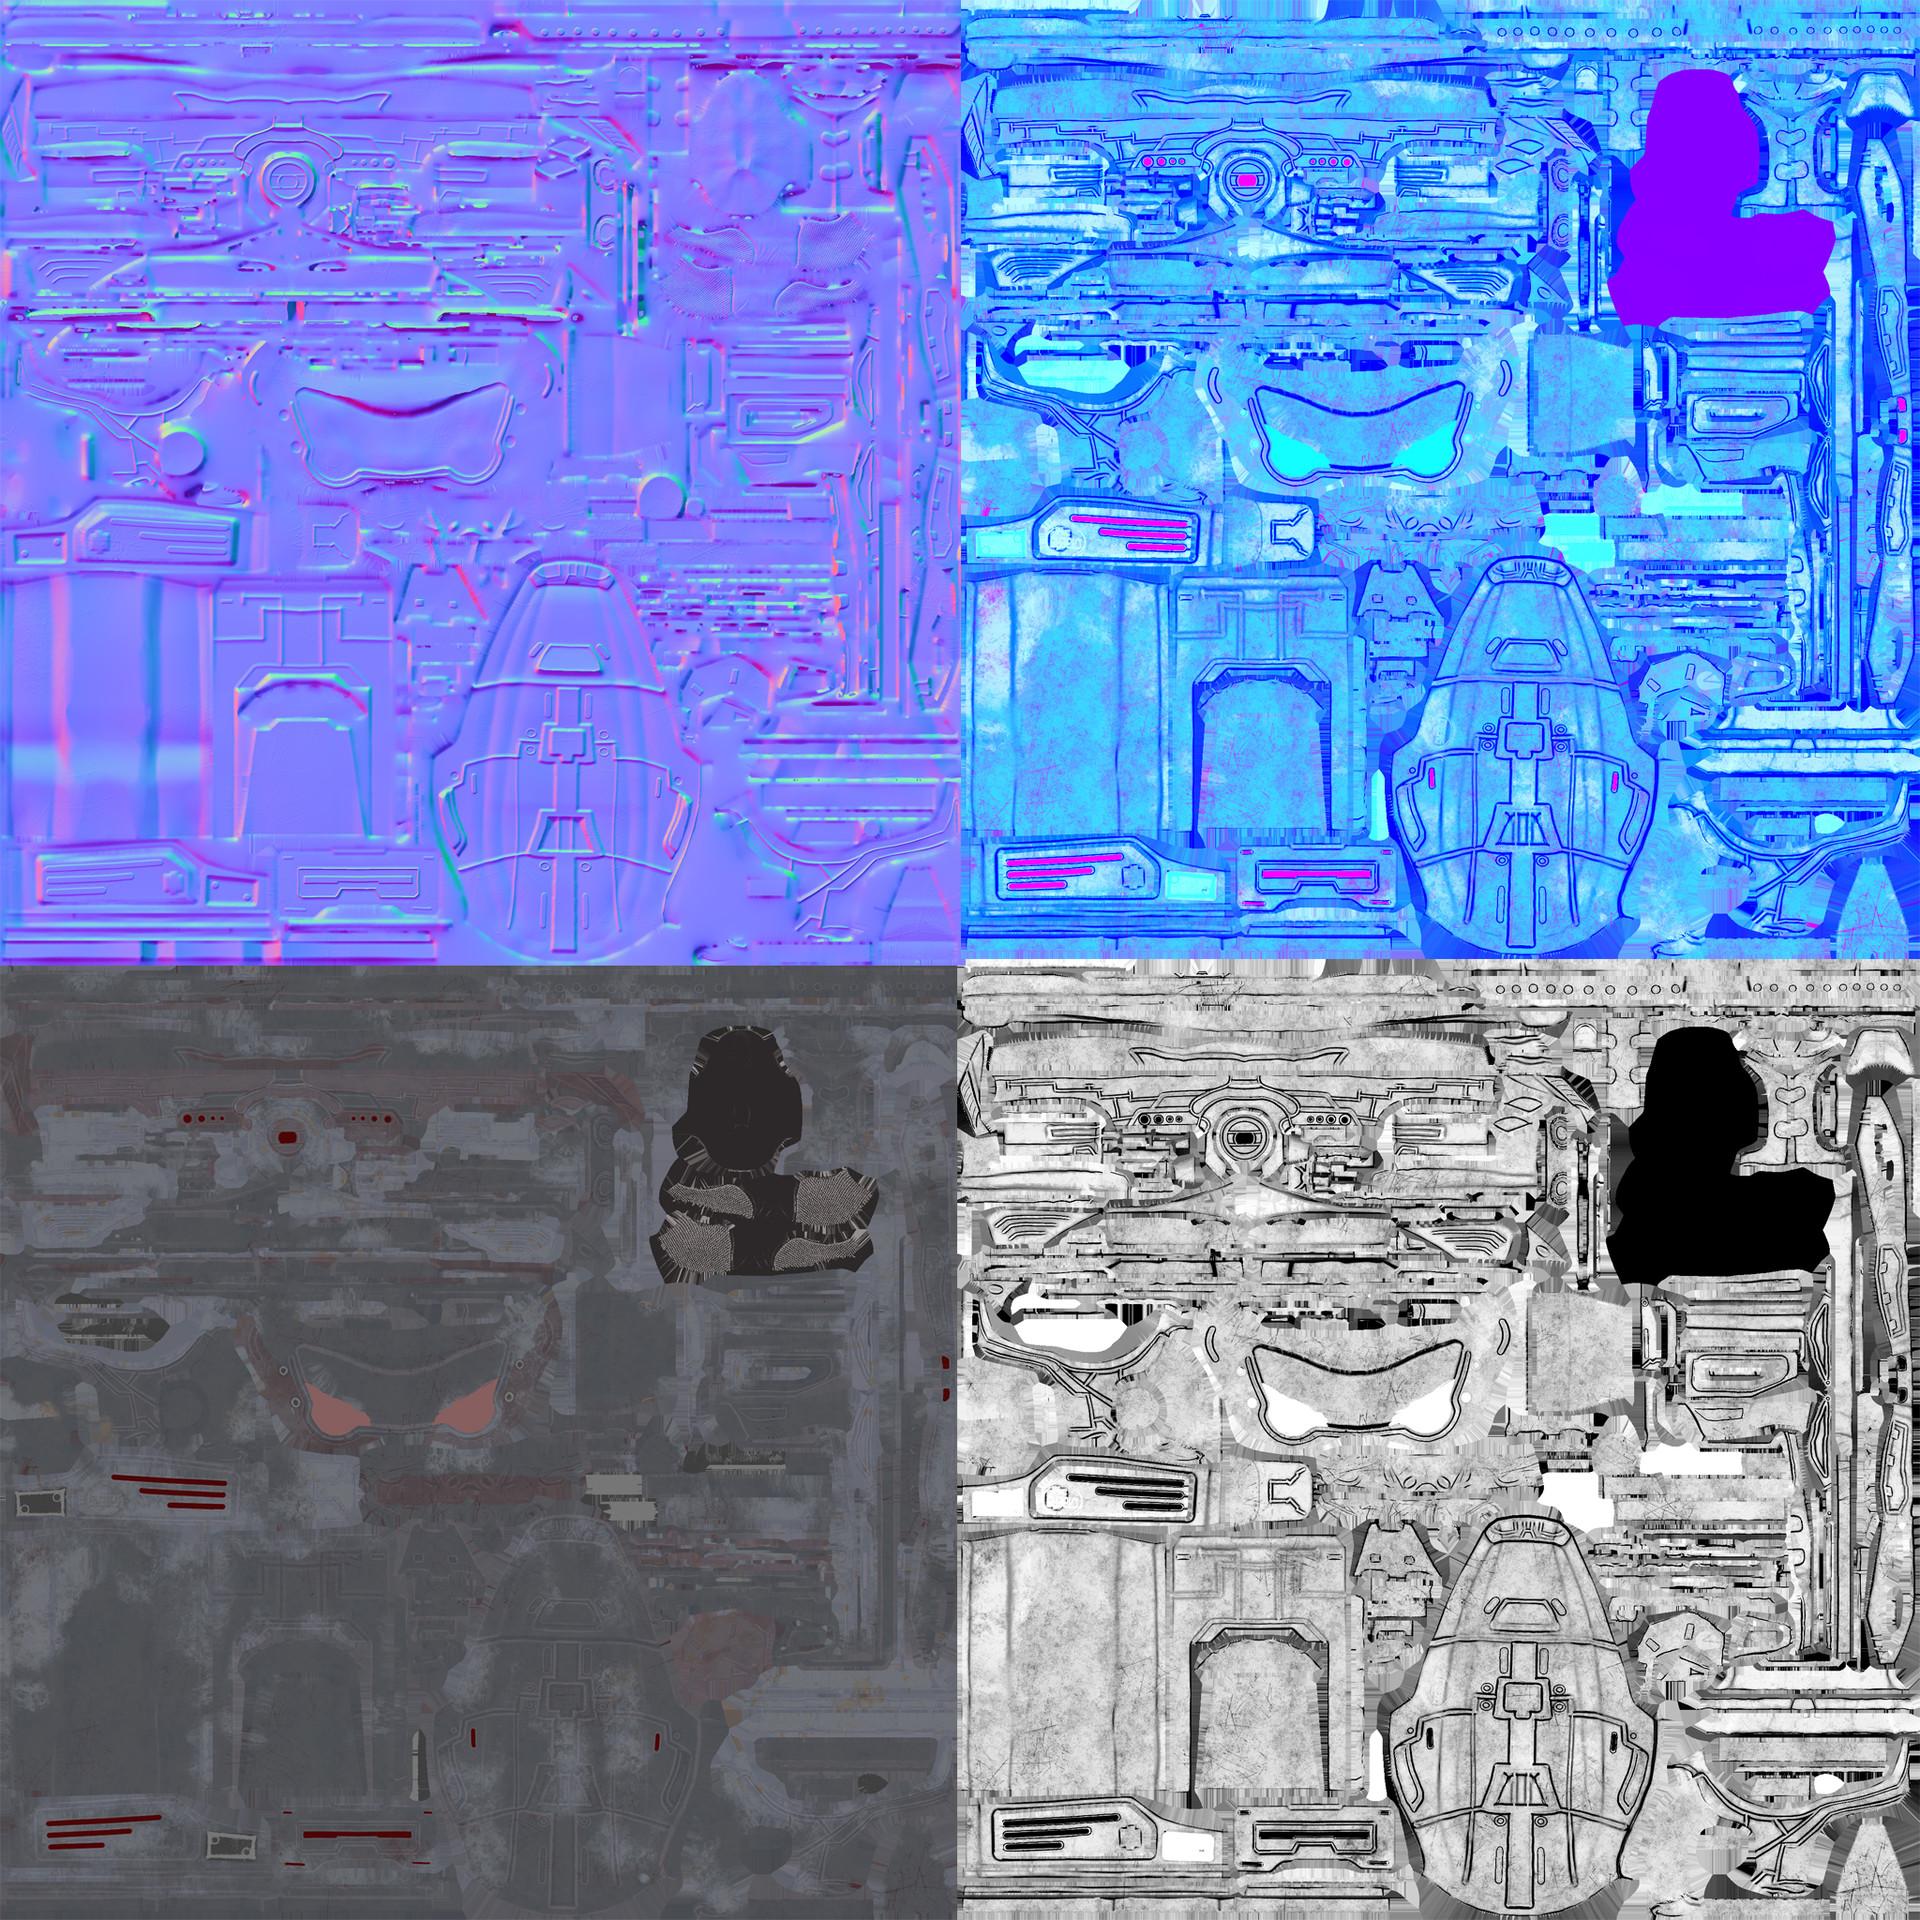 Prince luthra maps